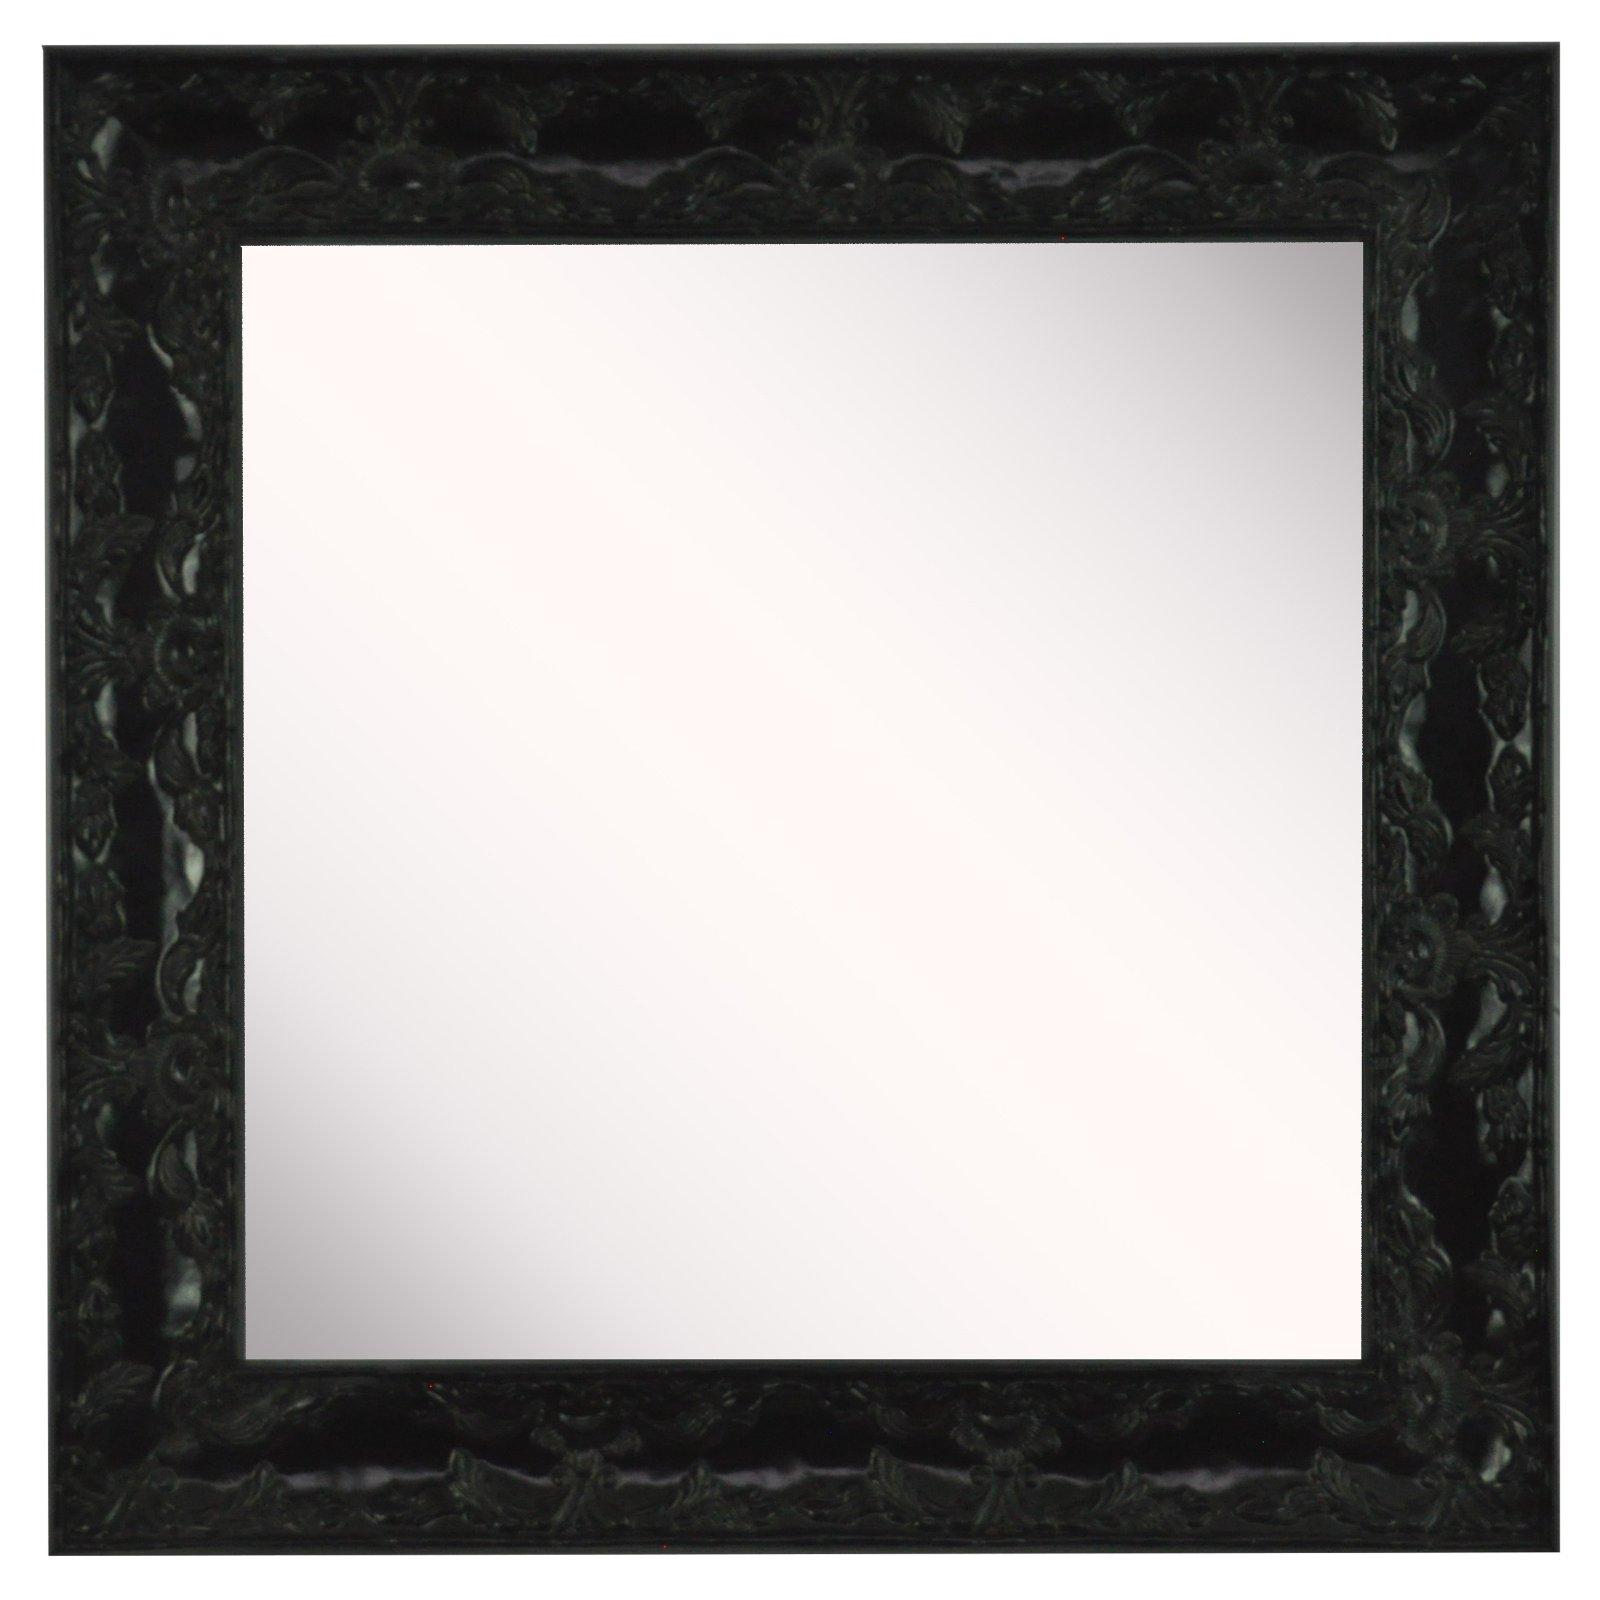 American Made Rayne Endicott Square Wall Mirror - Black - Set of 4